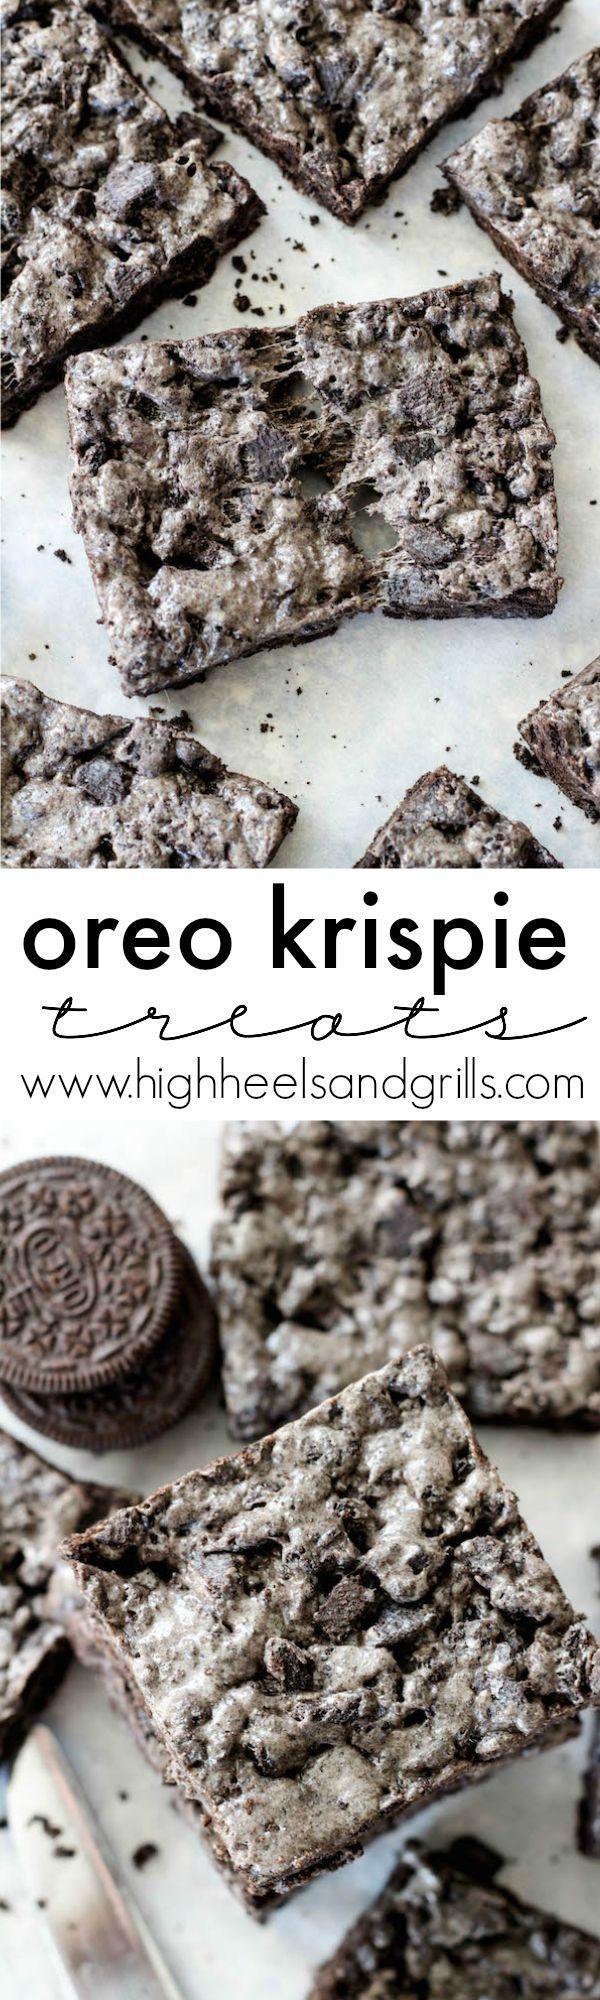 Photo of Oreo Krispie Treats